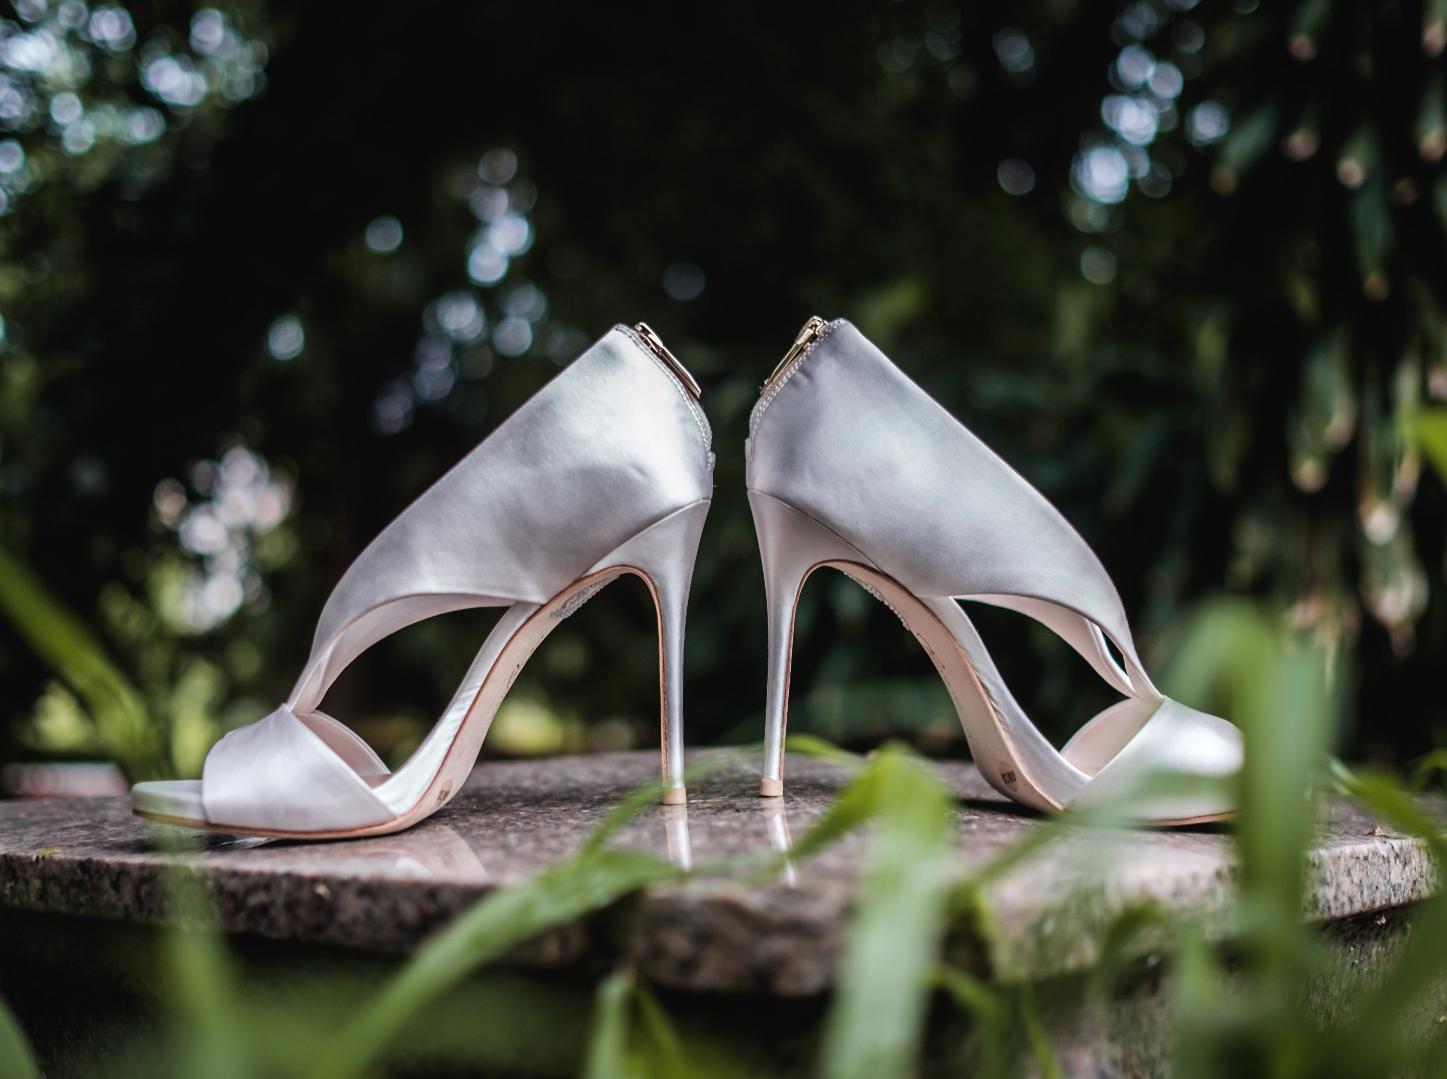 bodas-sin-clasificar-sin-tema-cuba-35361.jpg